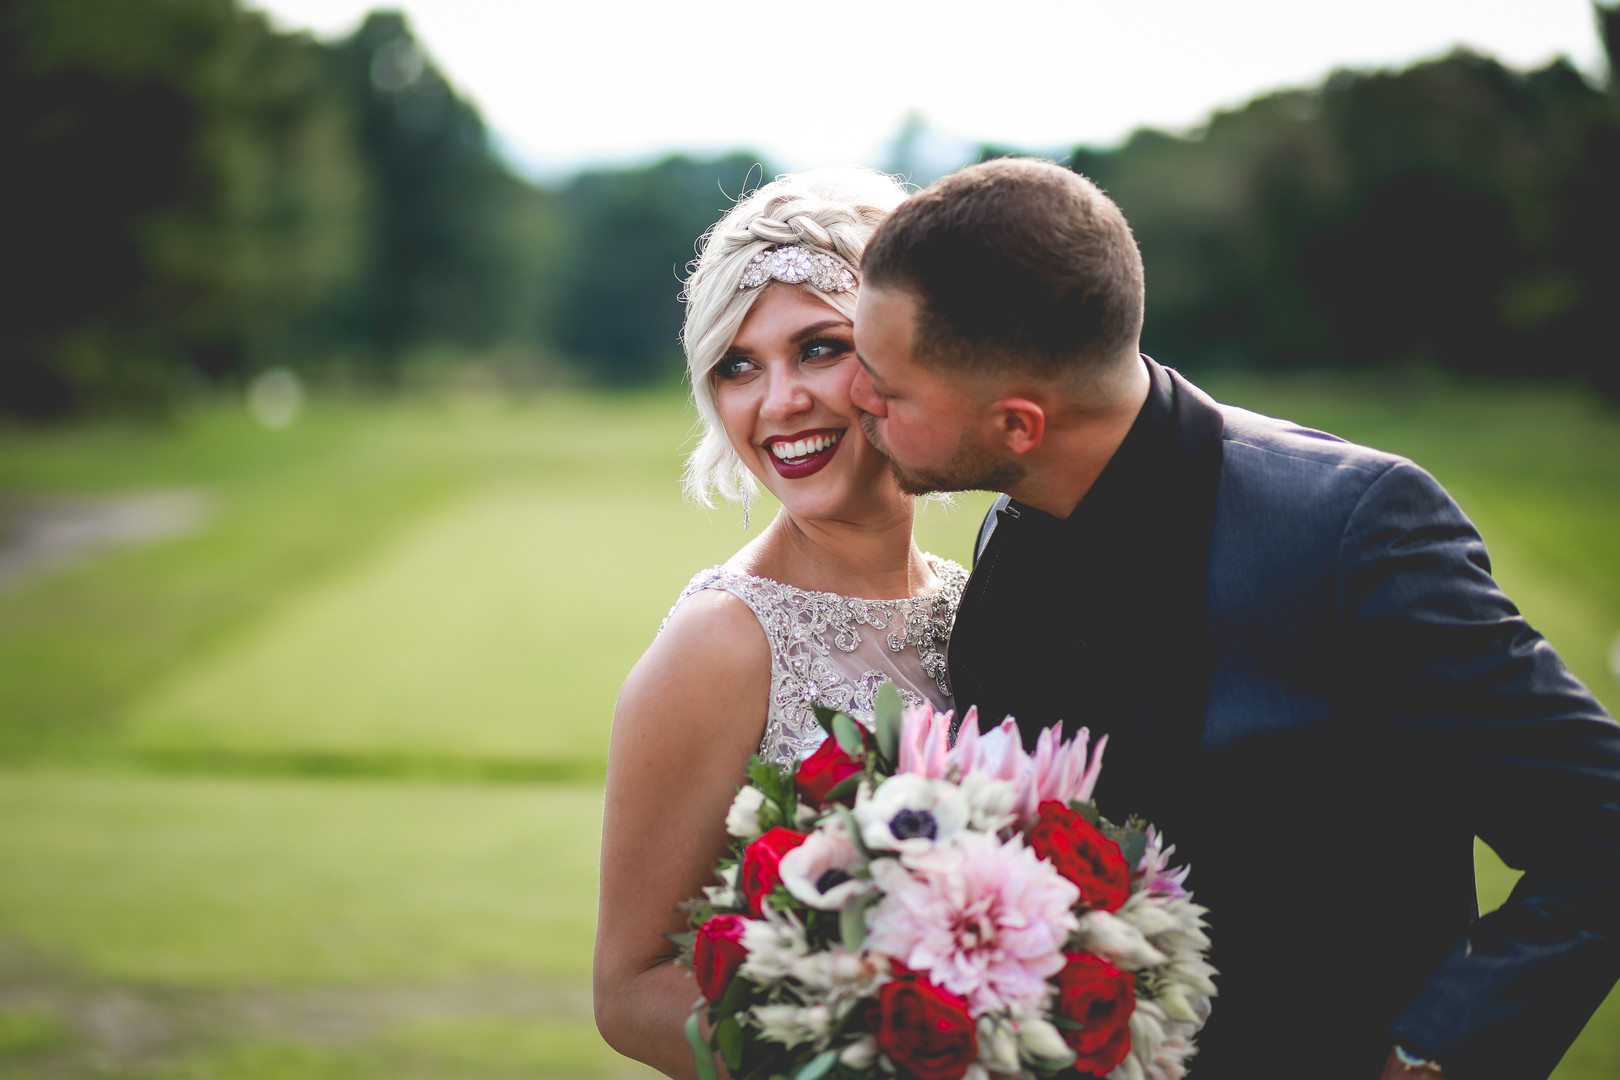 wedding-day-photos-love.jpg